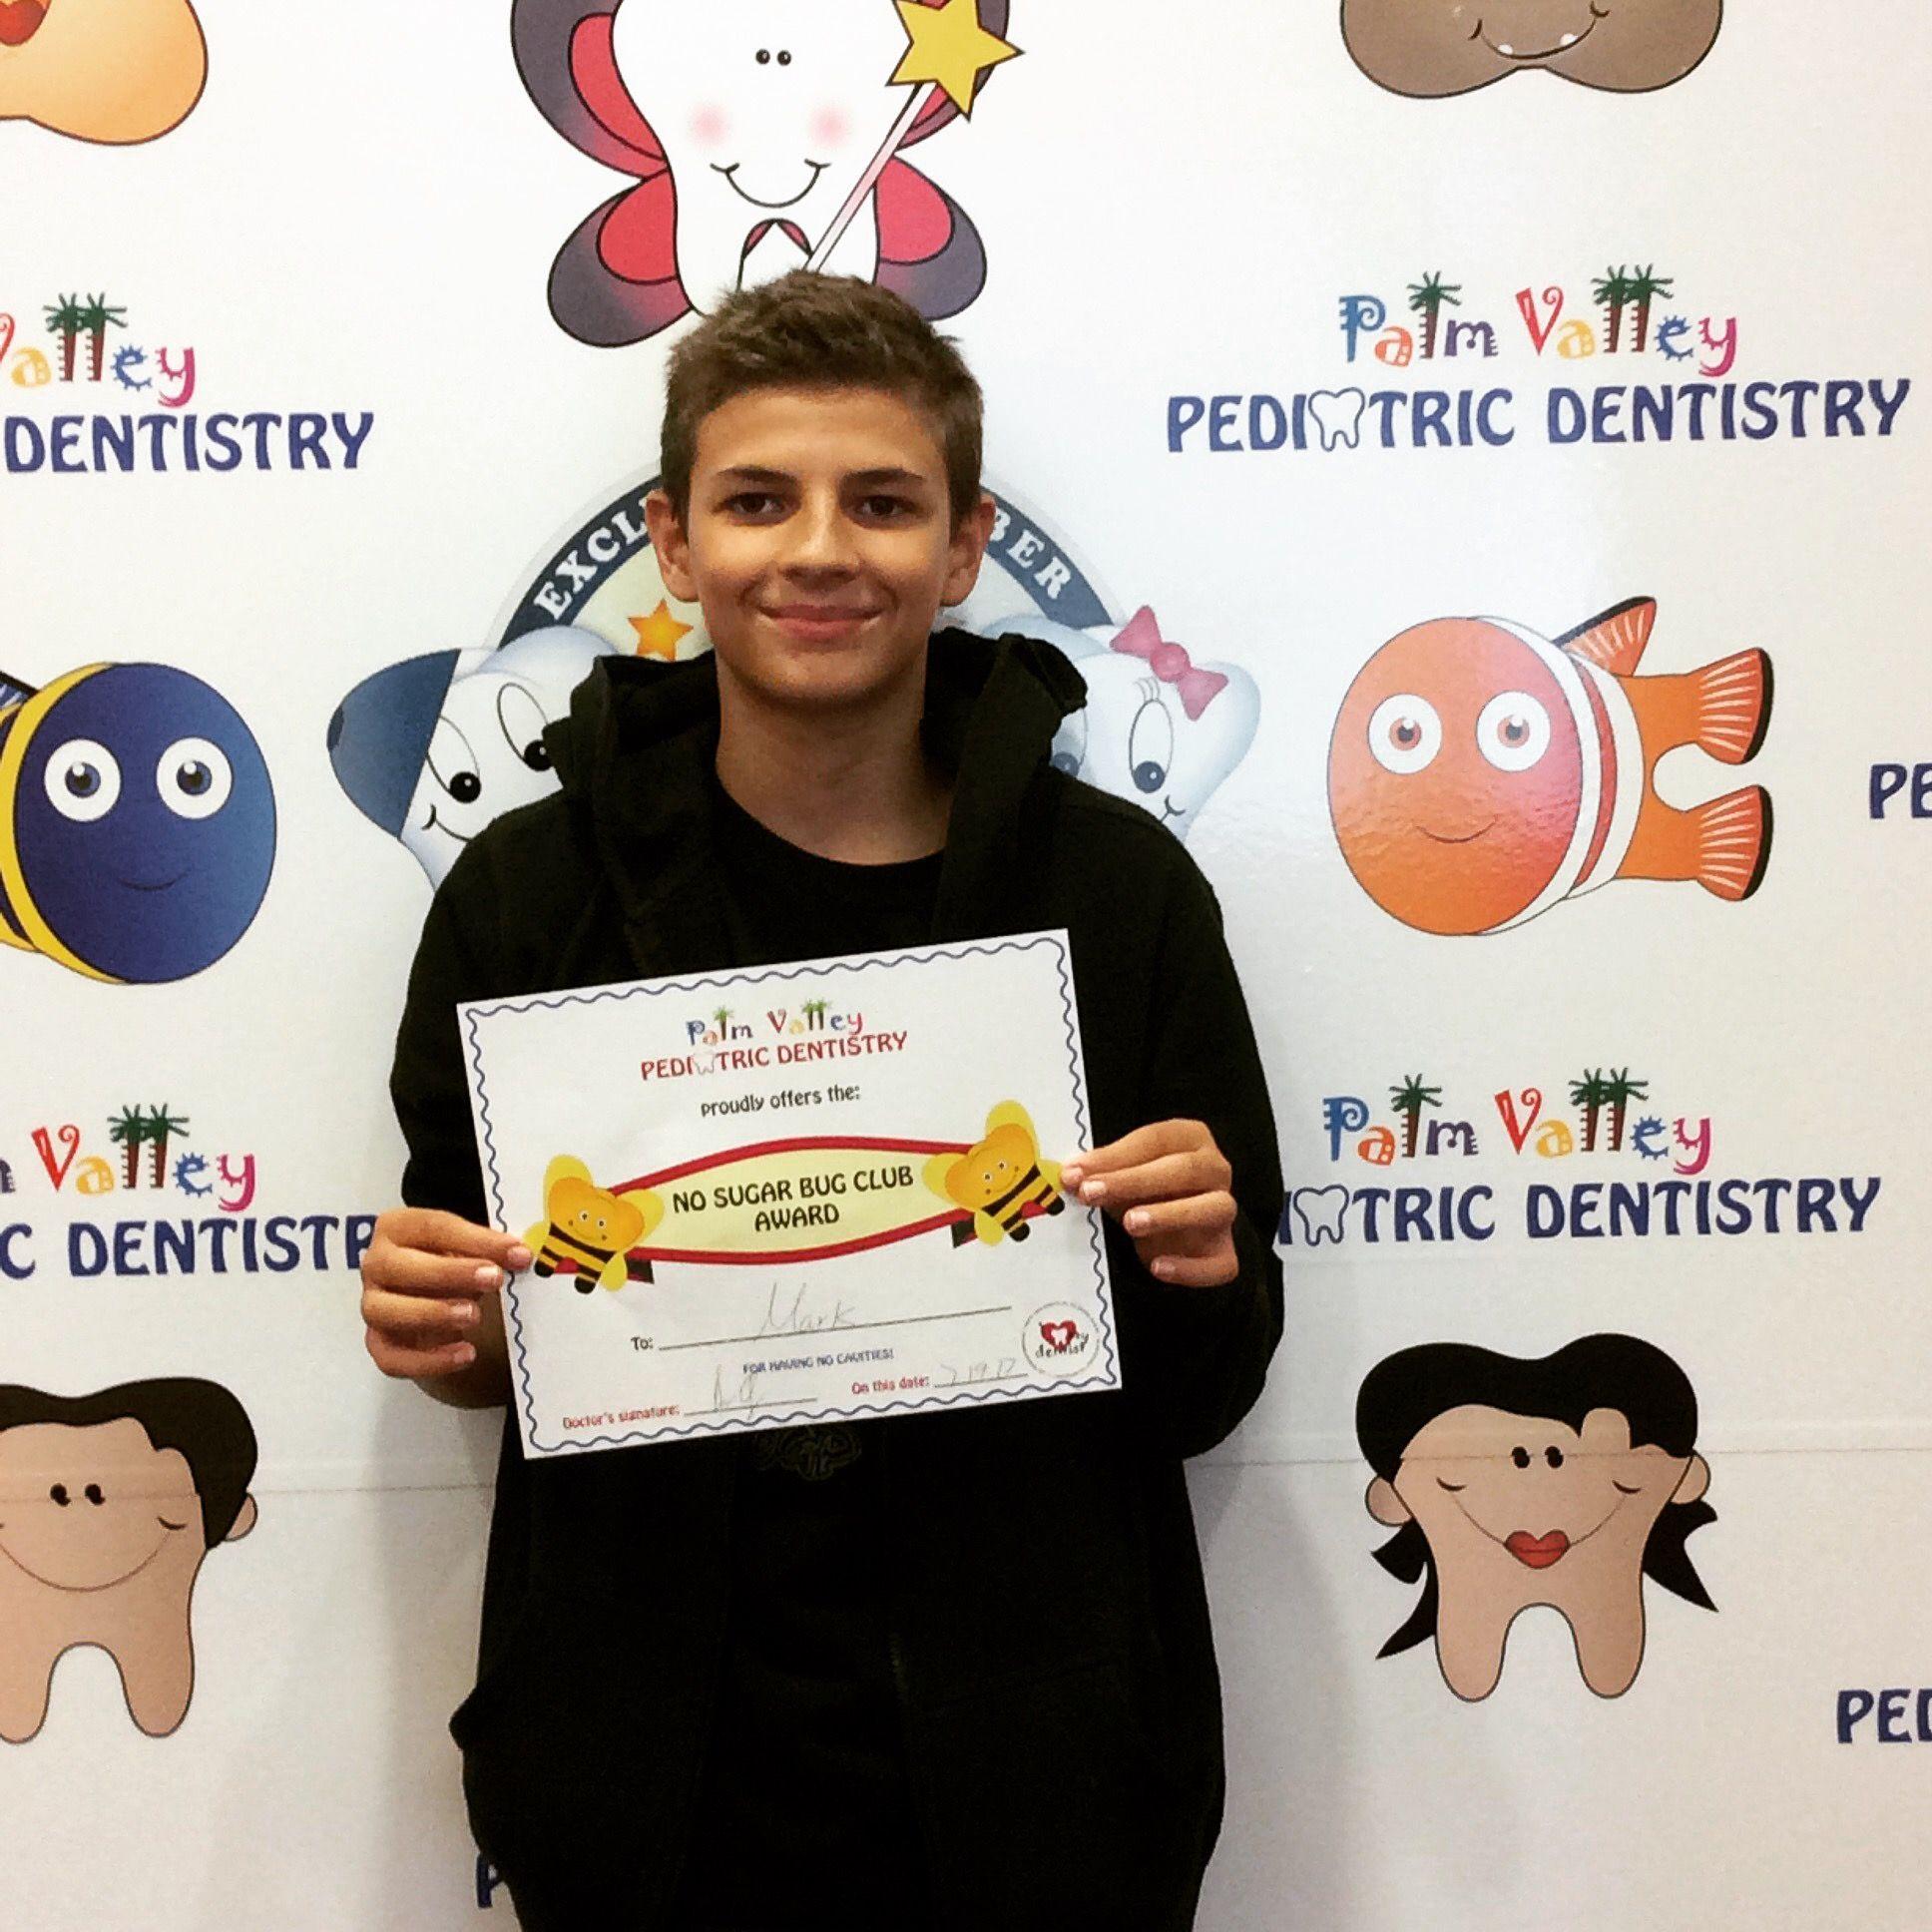 Palm Valley Pediatric Dentistry No Cavity Club pvpd pvpd